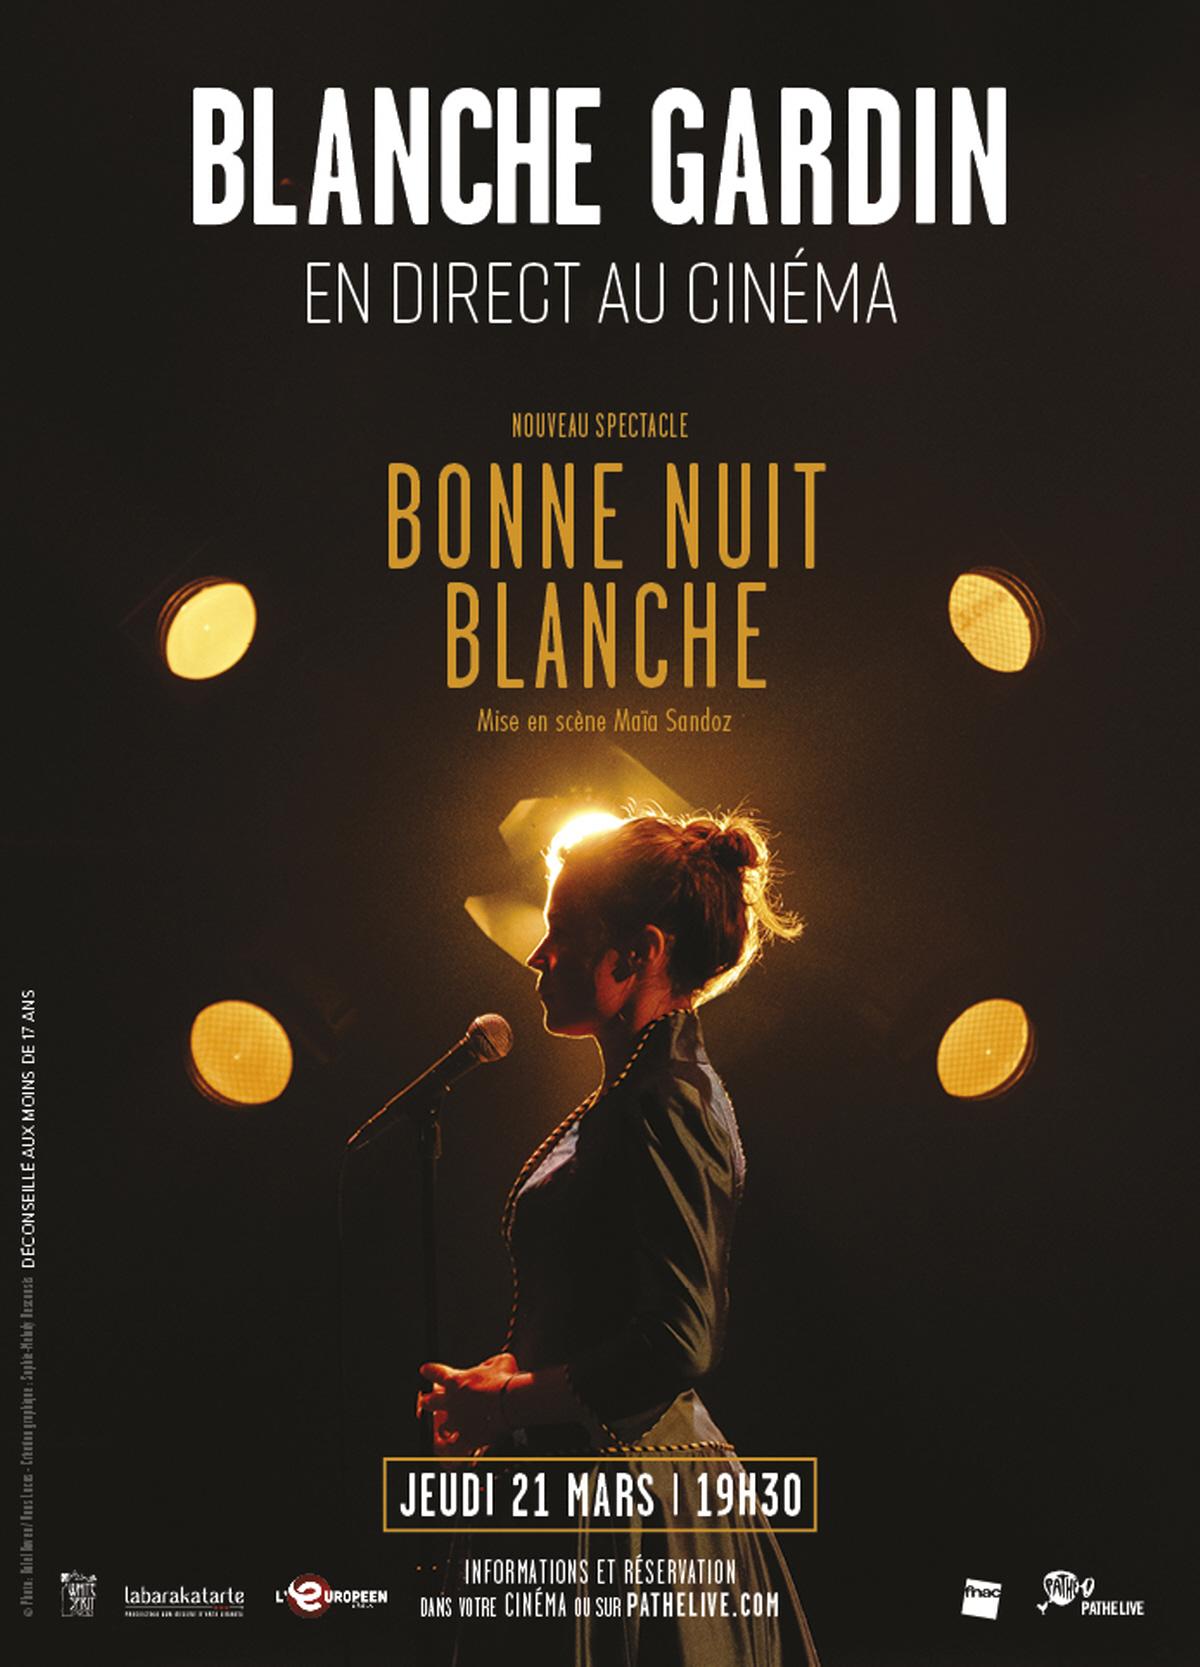 affiche du film Blanche Gardin : Bonne Nuit Blanche